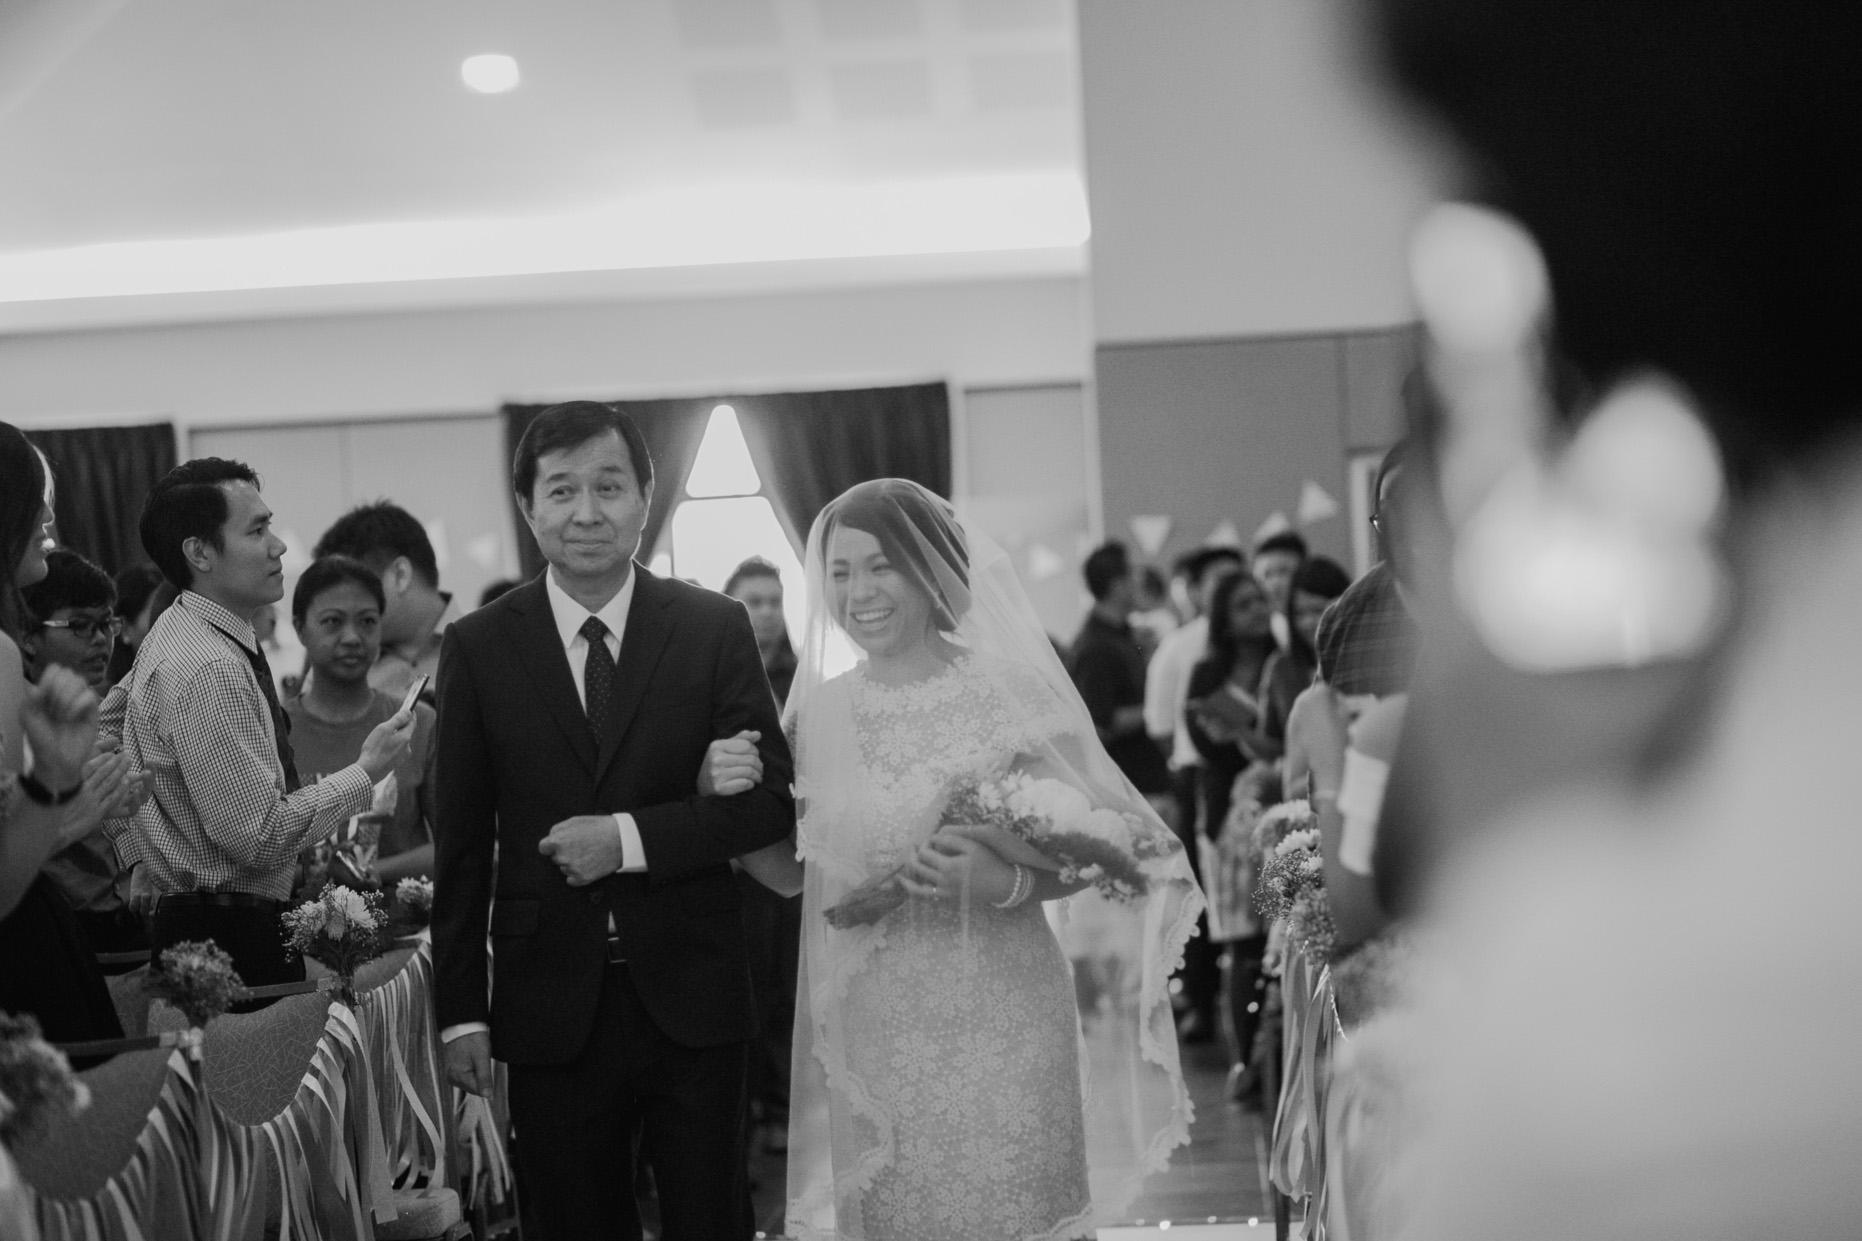 46-hellojanelee-sam grace-malaysia-wedding-day